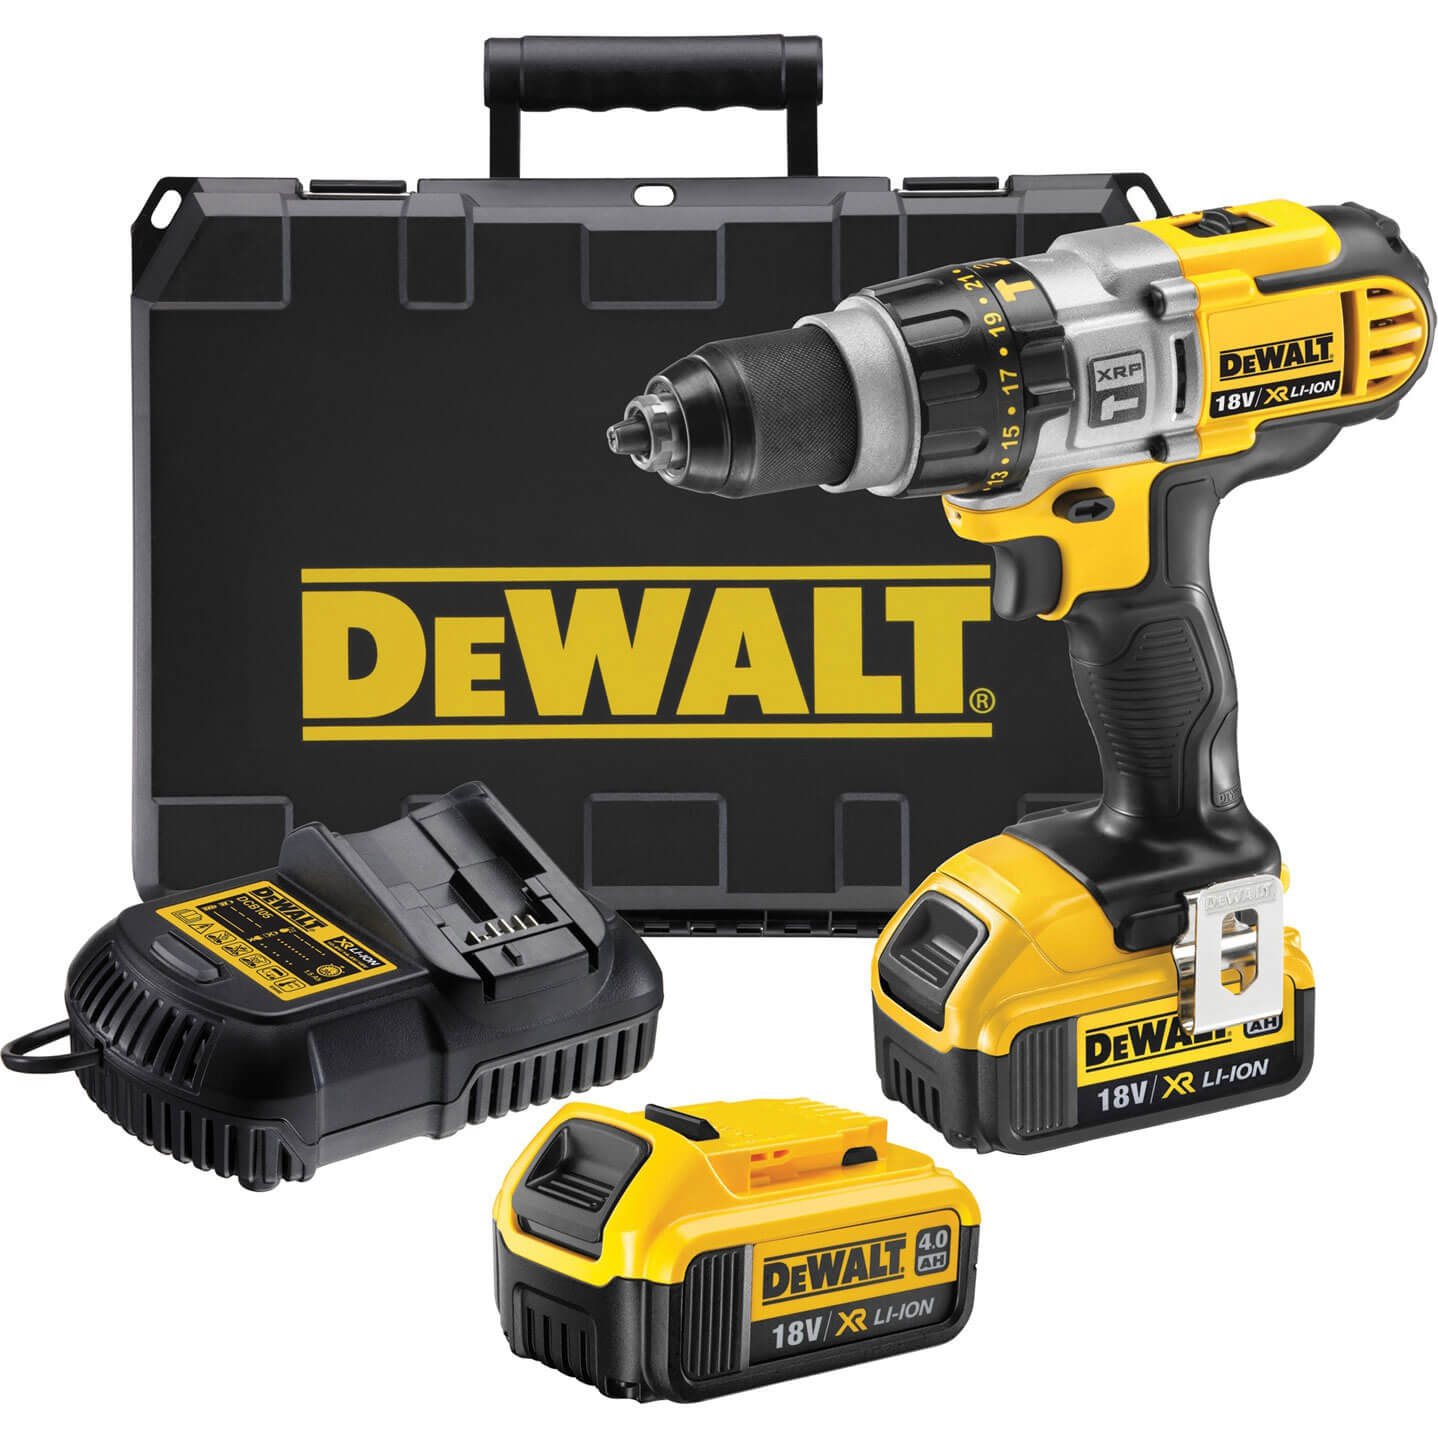 DeWalt DCD985 18v XR Cordless Combi Drill 2 x 4ah Liion Charger Case